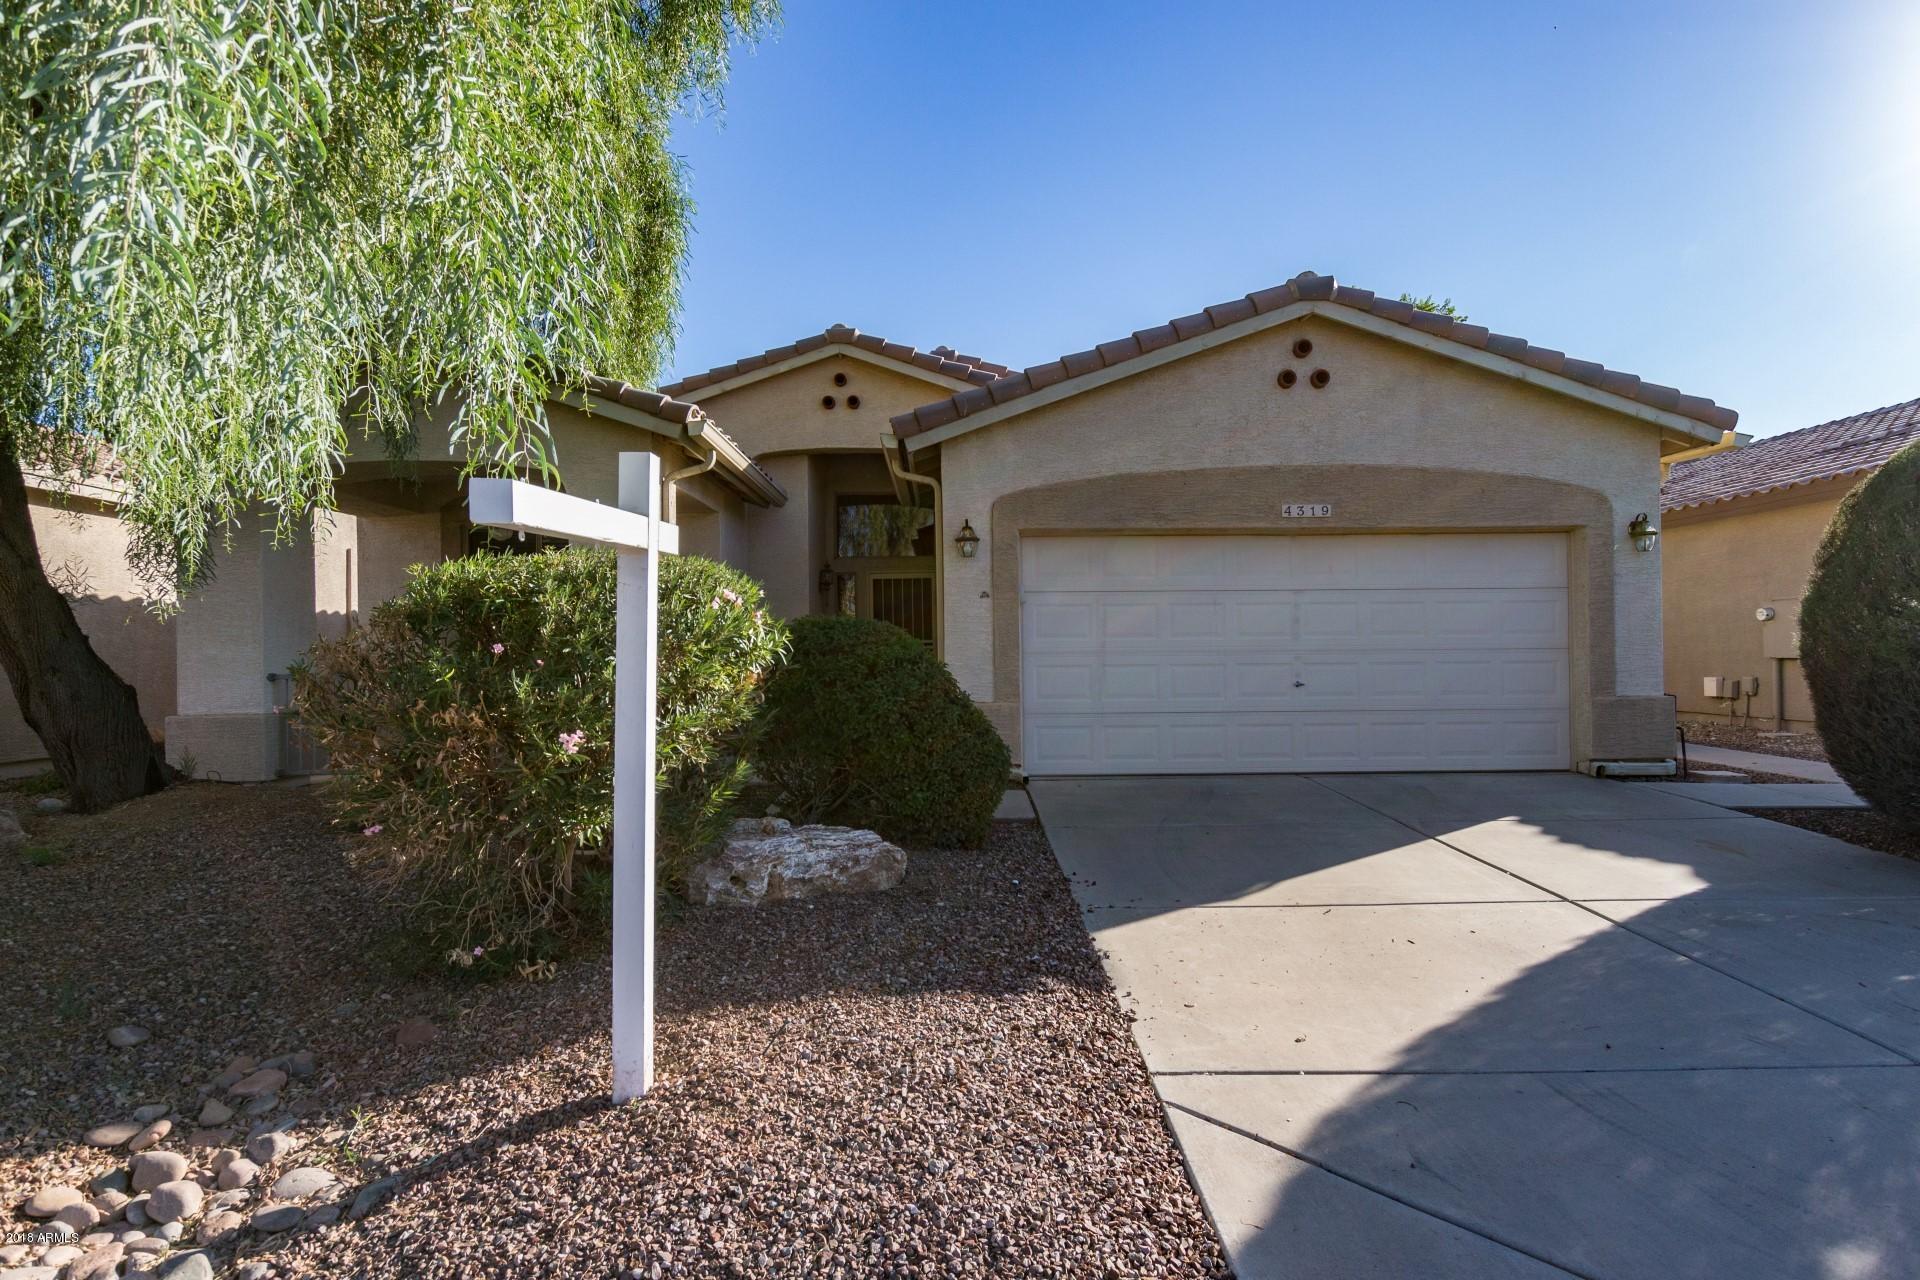 Photo for 4319 E Walnut Road, Gilbert, AZ 85298 (MLS # 5823920)